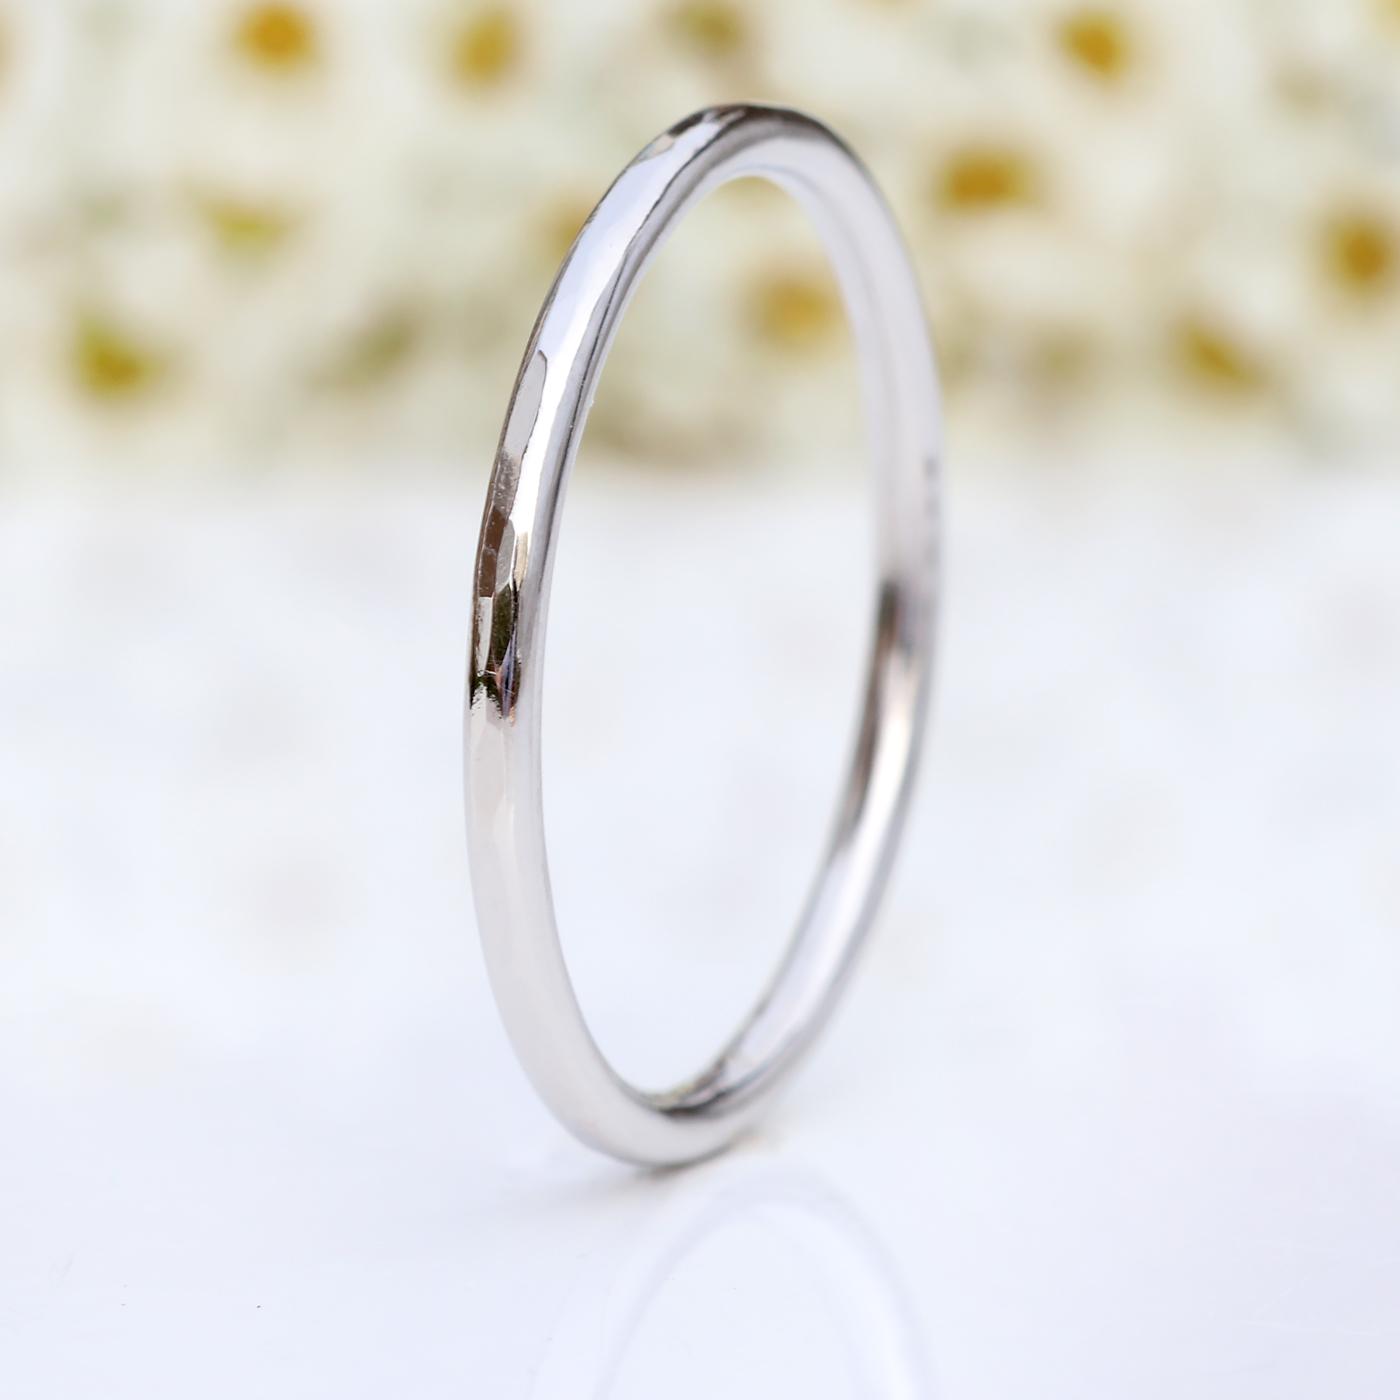 144c39d9e0 1.5mm Halo Platinum Wedding Ring | Wedding Bands | Lilia Nash Jewellery